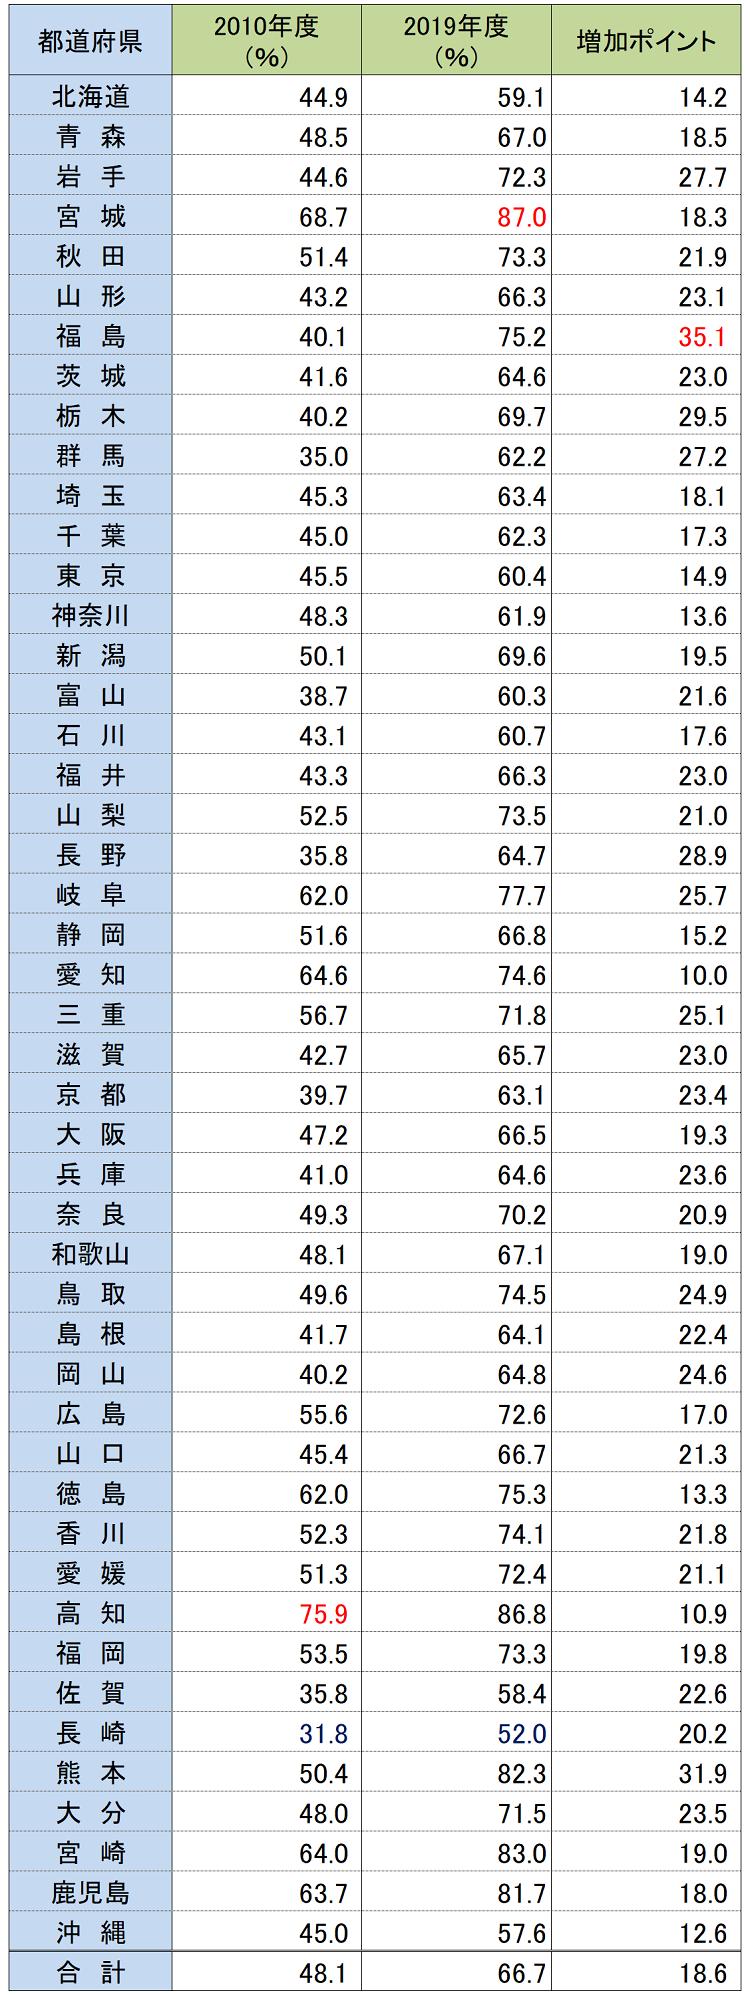 都道府県別の地震保険世帯加入率と保有契約件数の2010年度と2019年度の比較